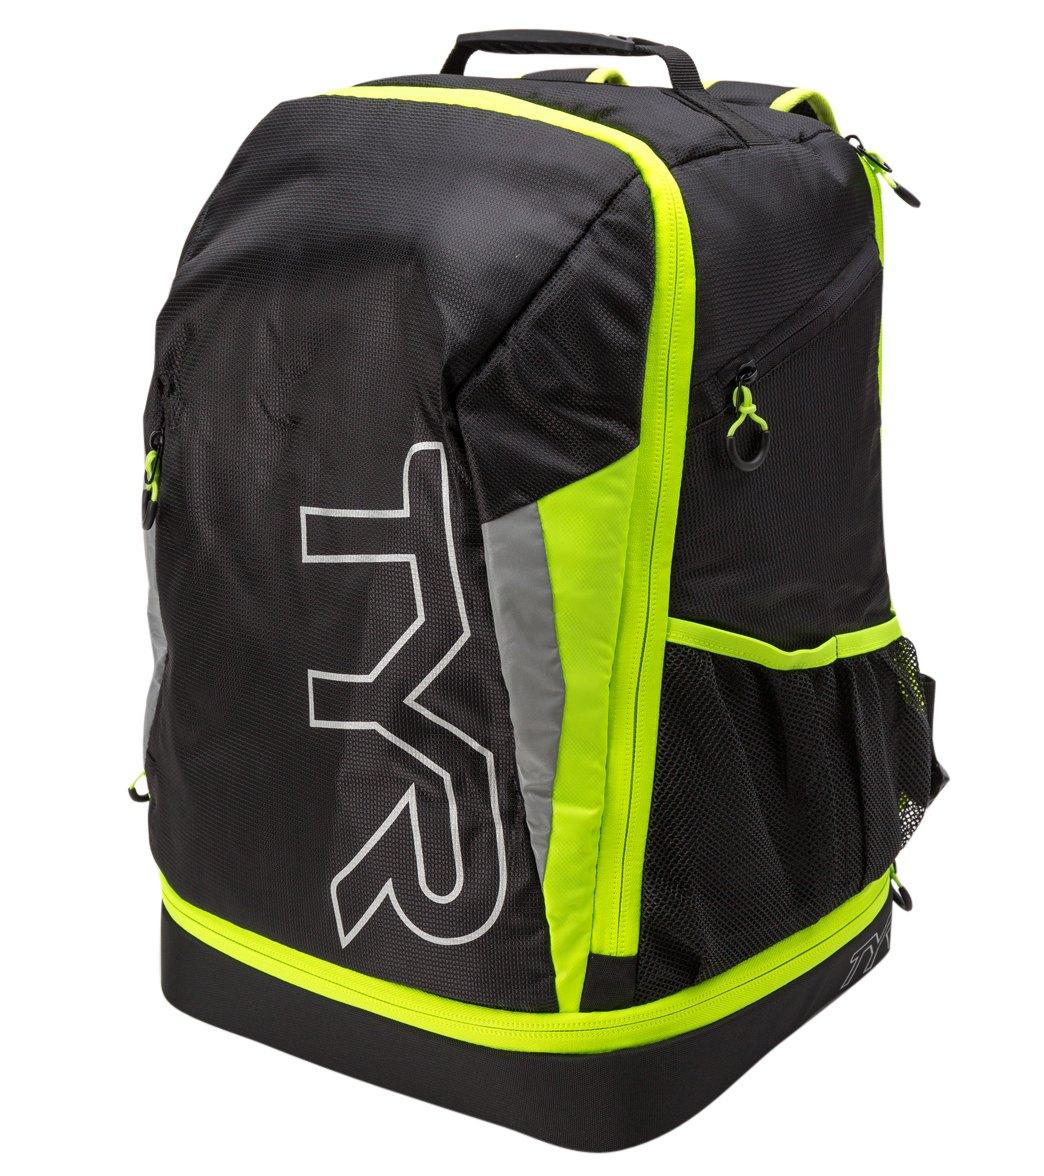 Tyr Triathlon Backpack